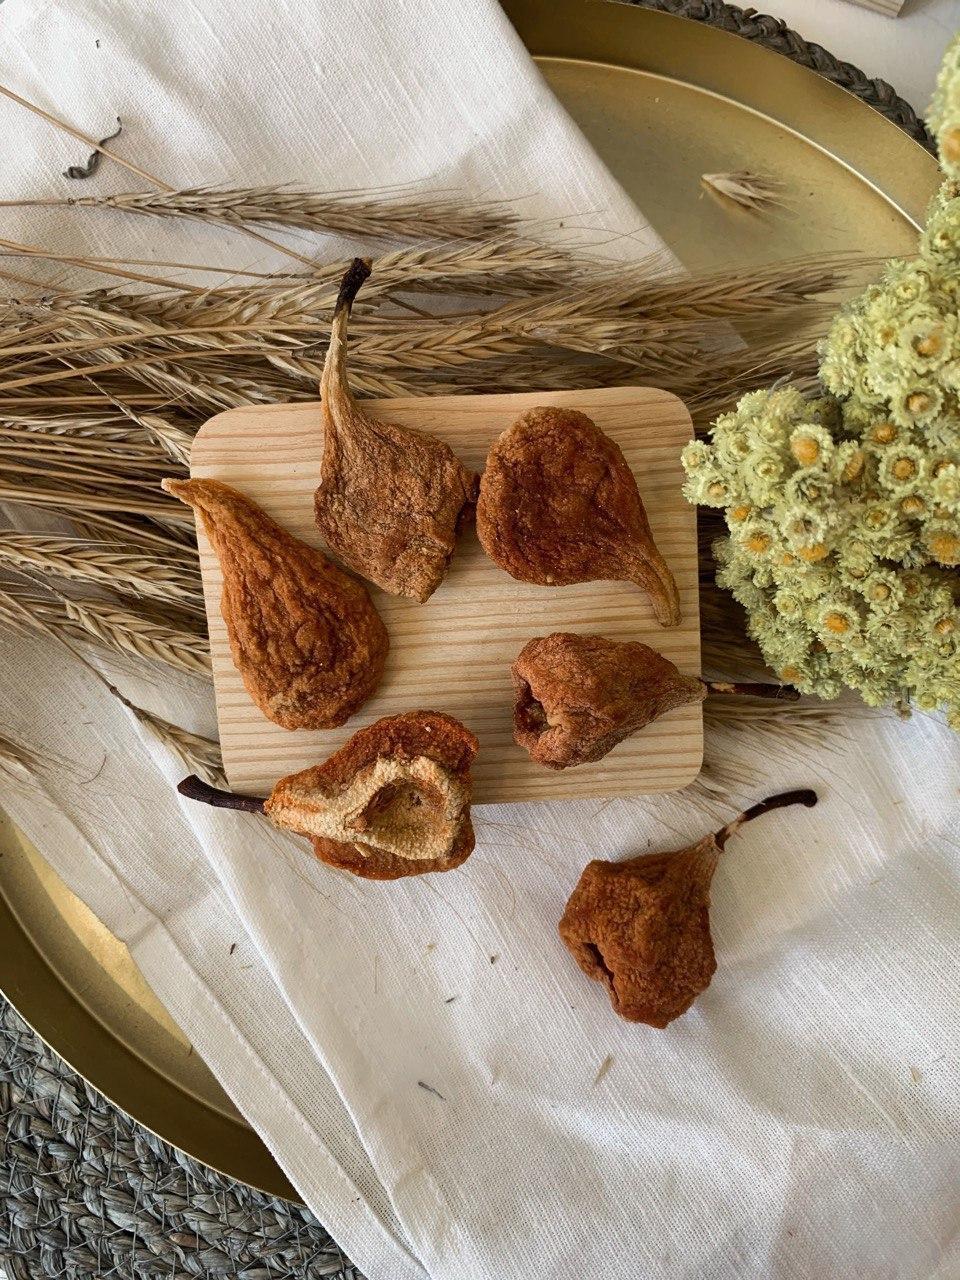 ГРУША сушена біо з Вірменії без цукру (Груша сушена біо з Вірменії без цукру)